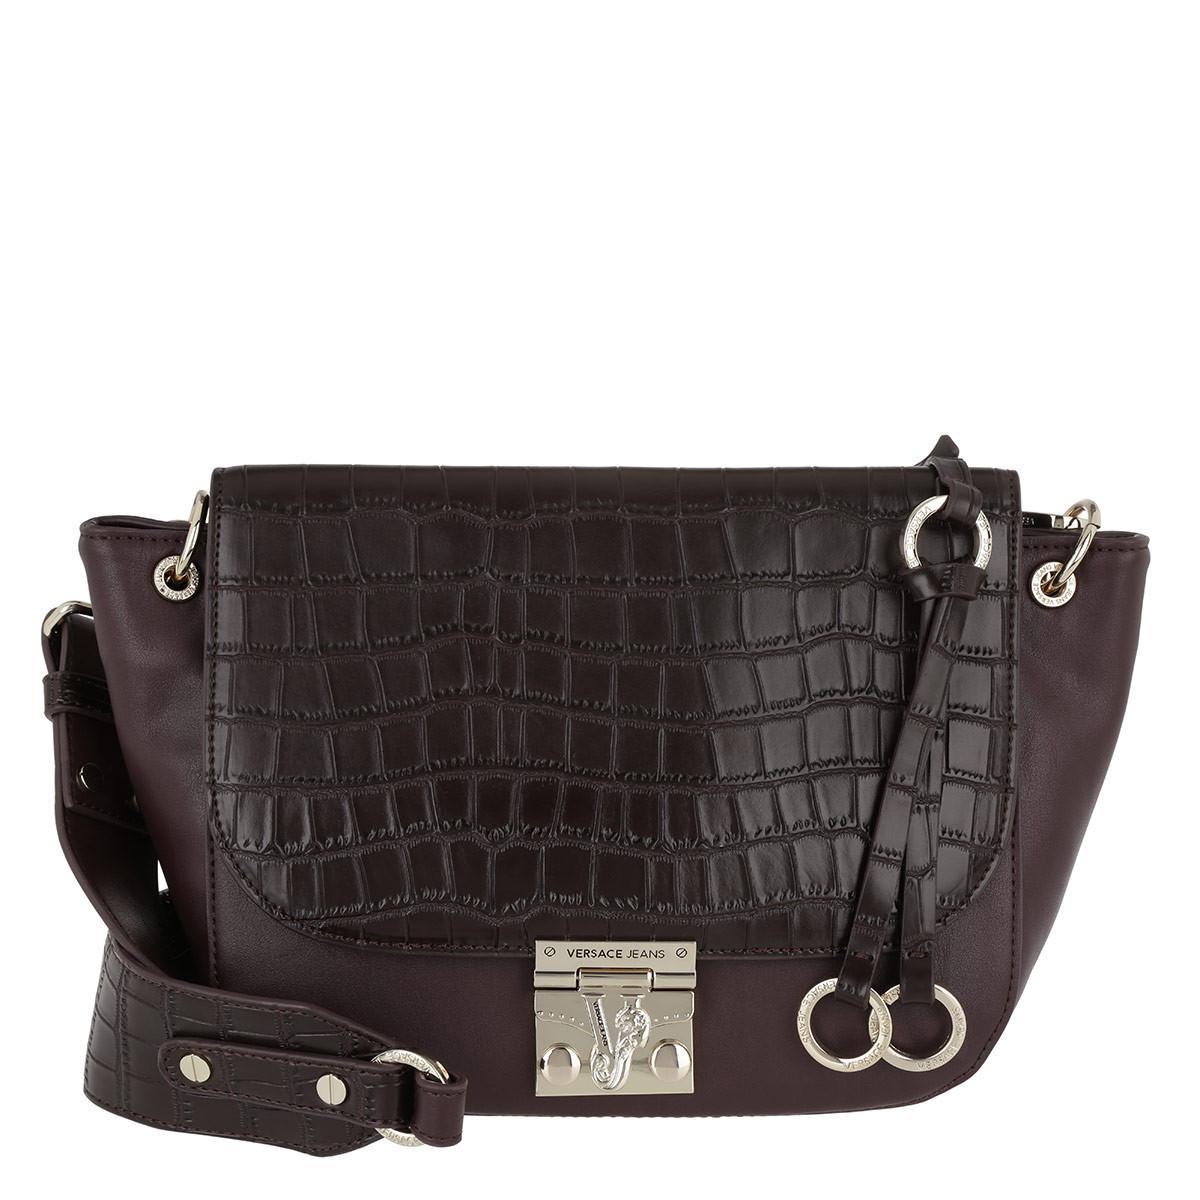 Versace Jeans Satchel Croco Mandorla in Black - Lyst 953ef67502